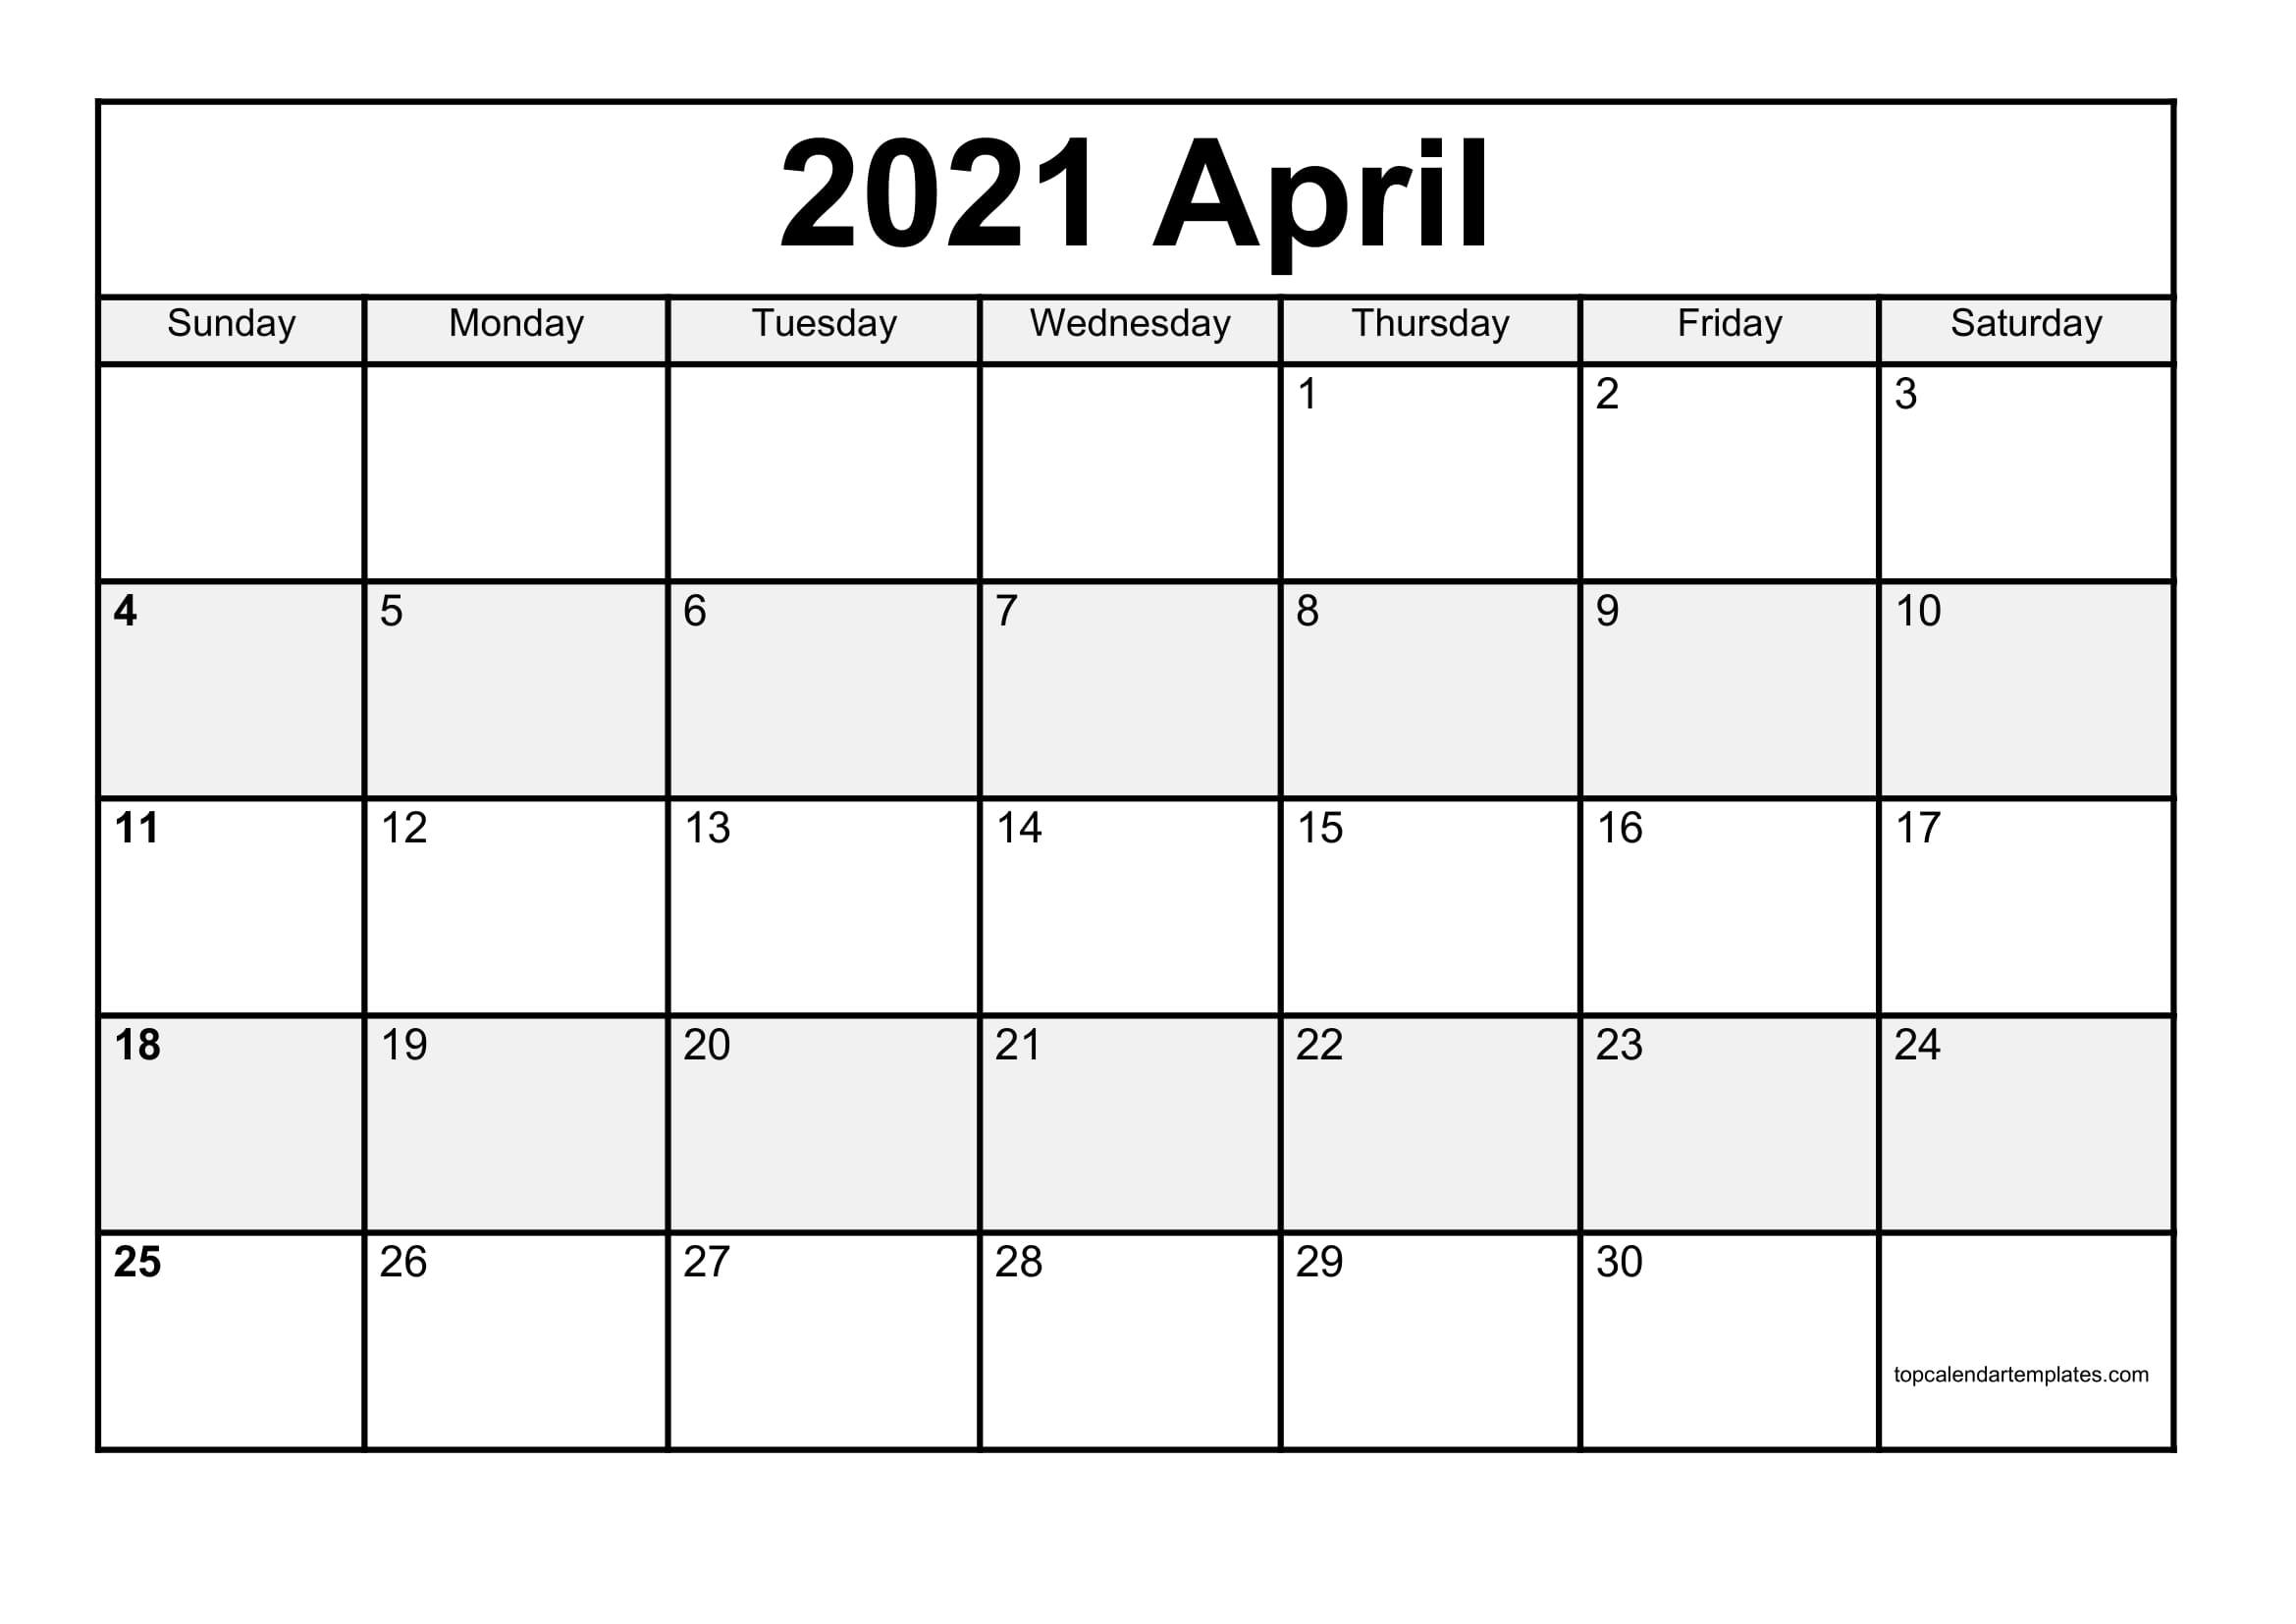 Free Printable Word Calendar April 2021 | Printable Calendar